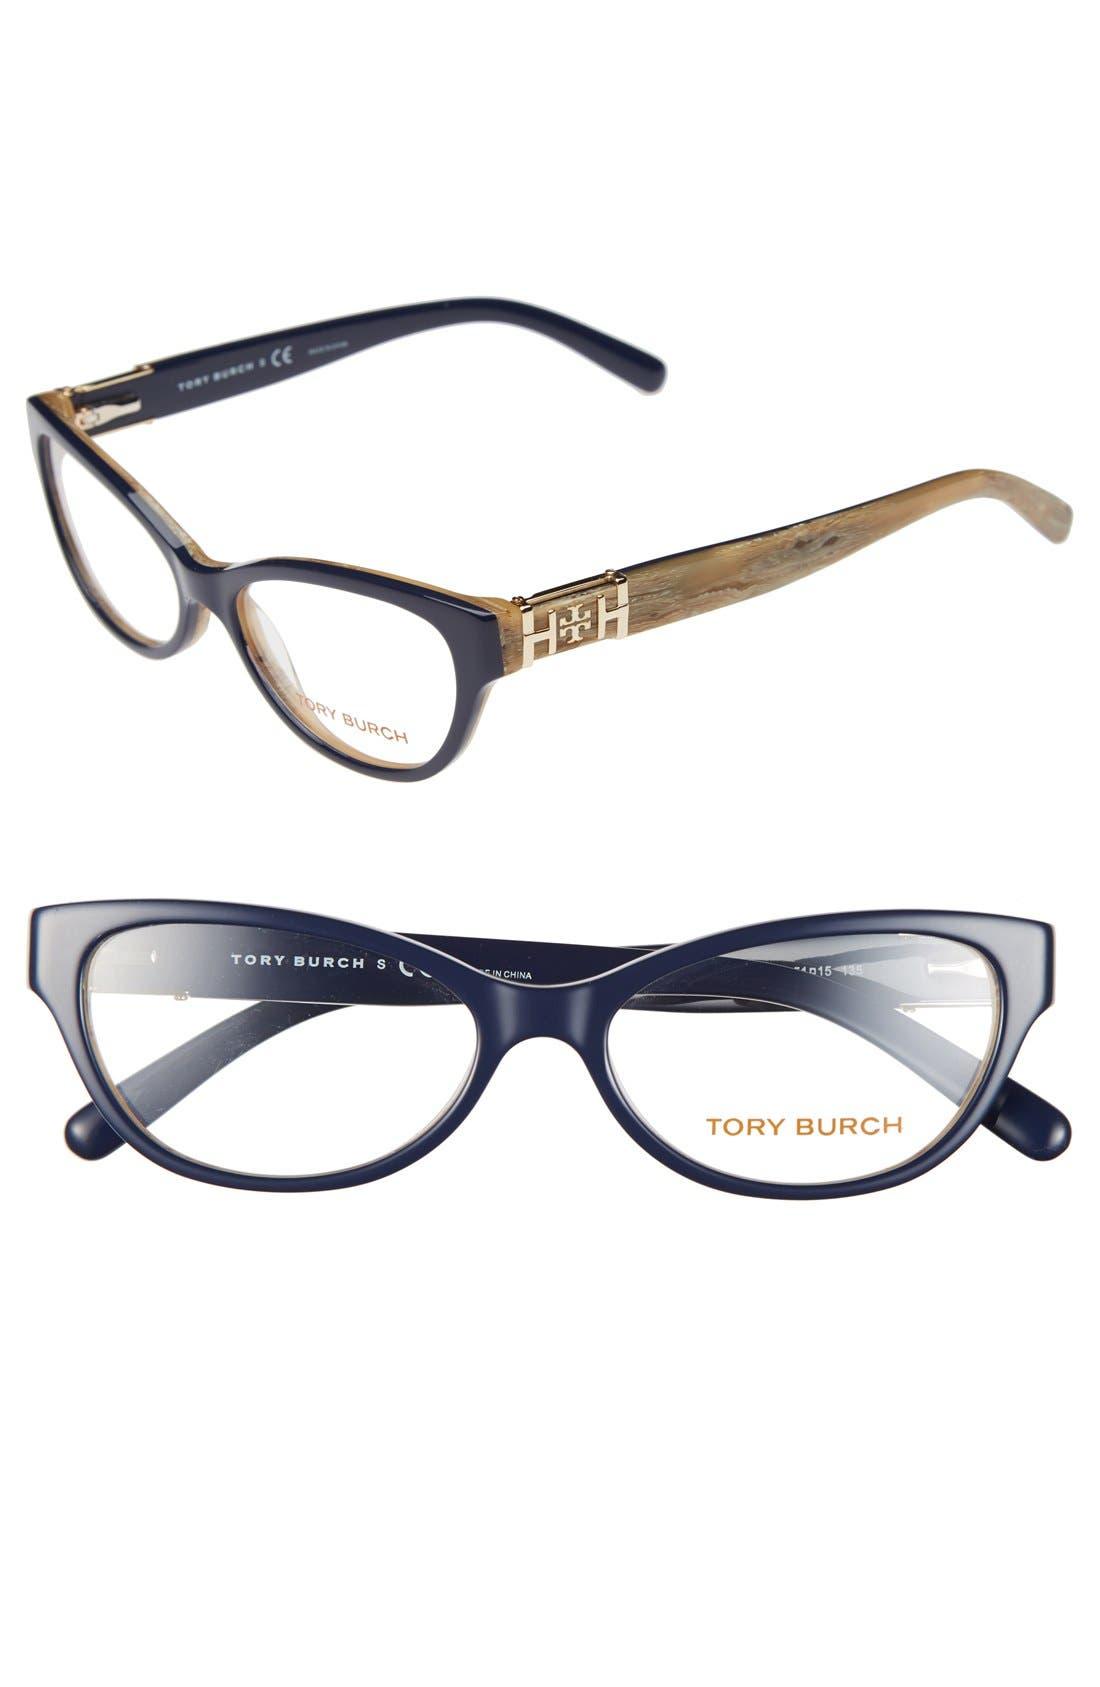 Main Image - Tory Burch 51mm Cat Eye Optical Glasses